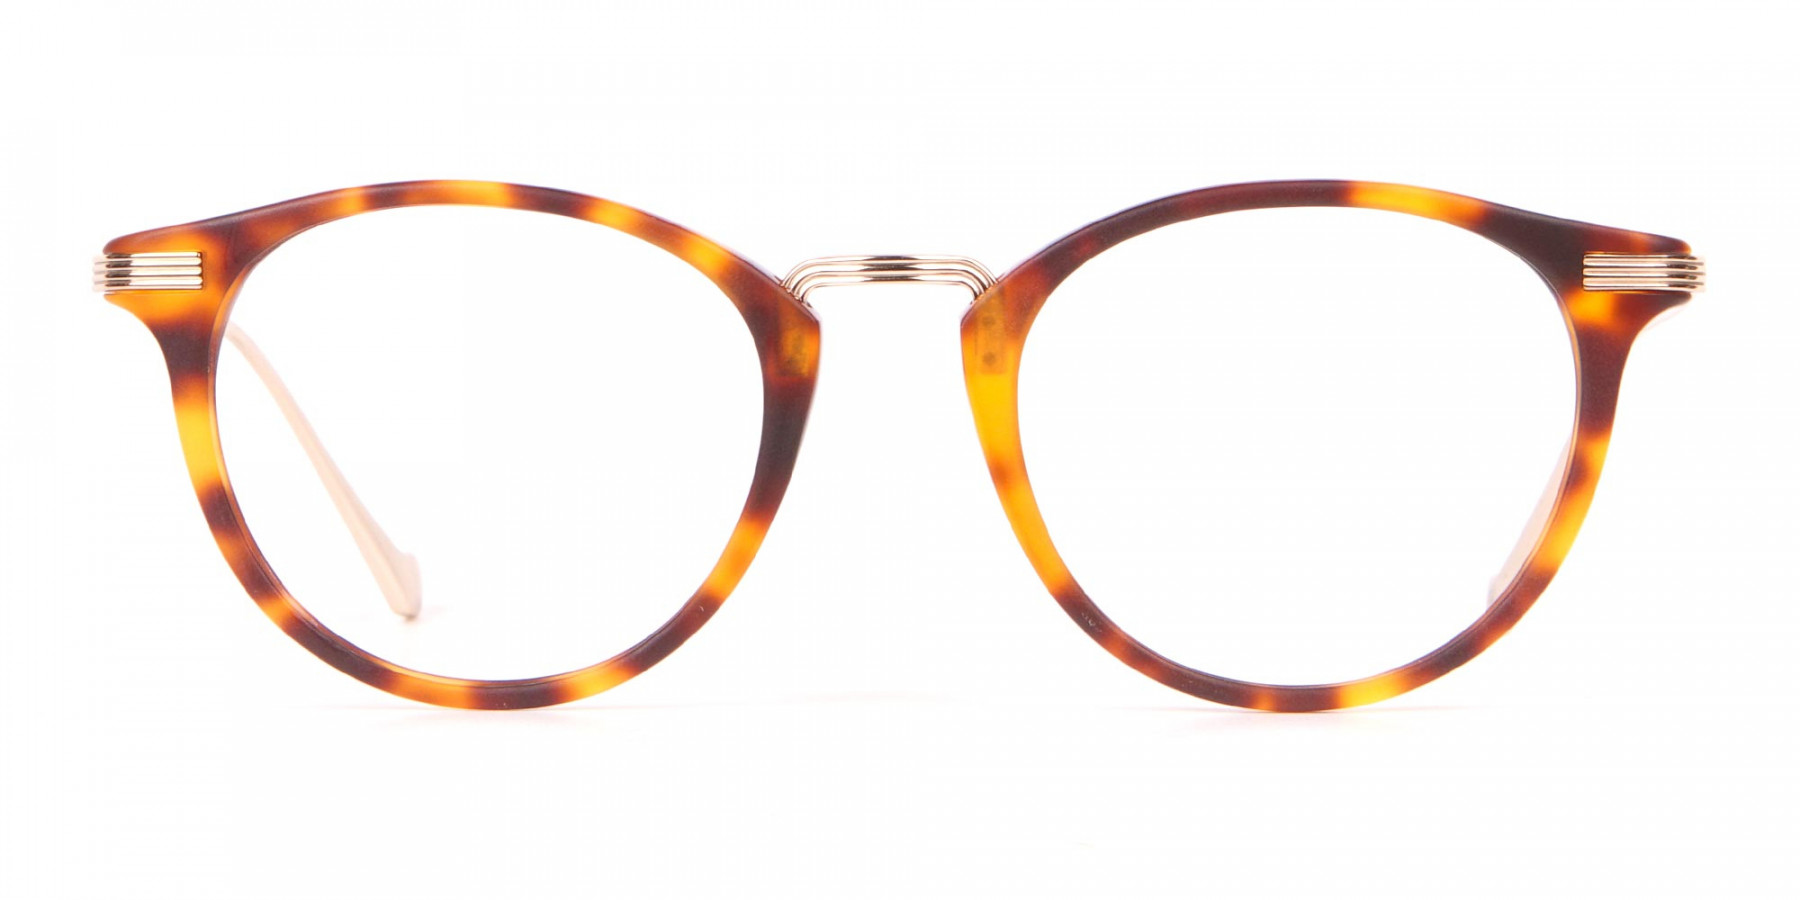 HACKETT Bespoke HEB173 Retro Round Glasses Tortoise & Gold-1